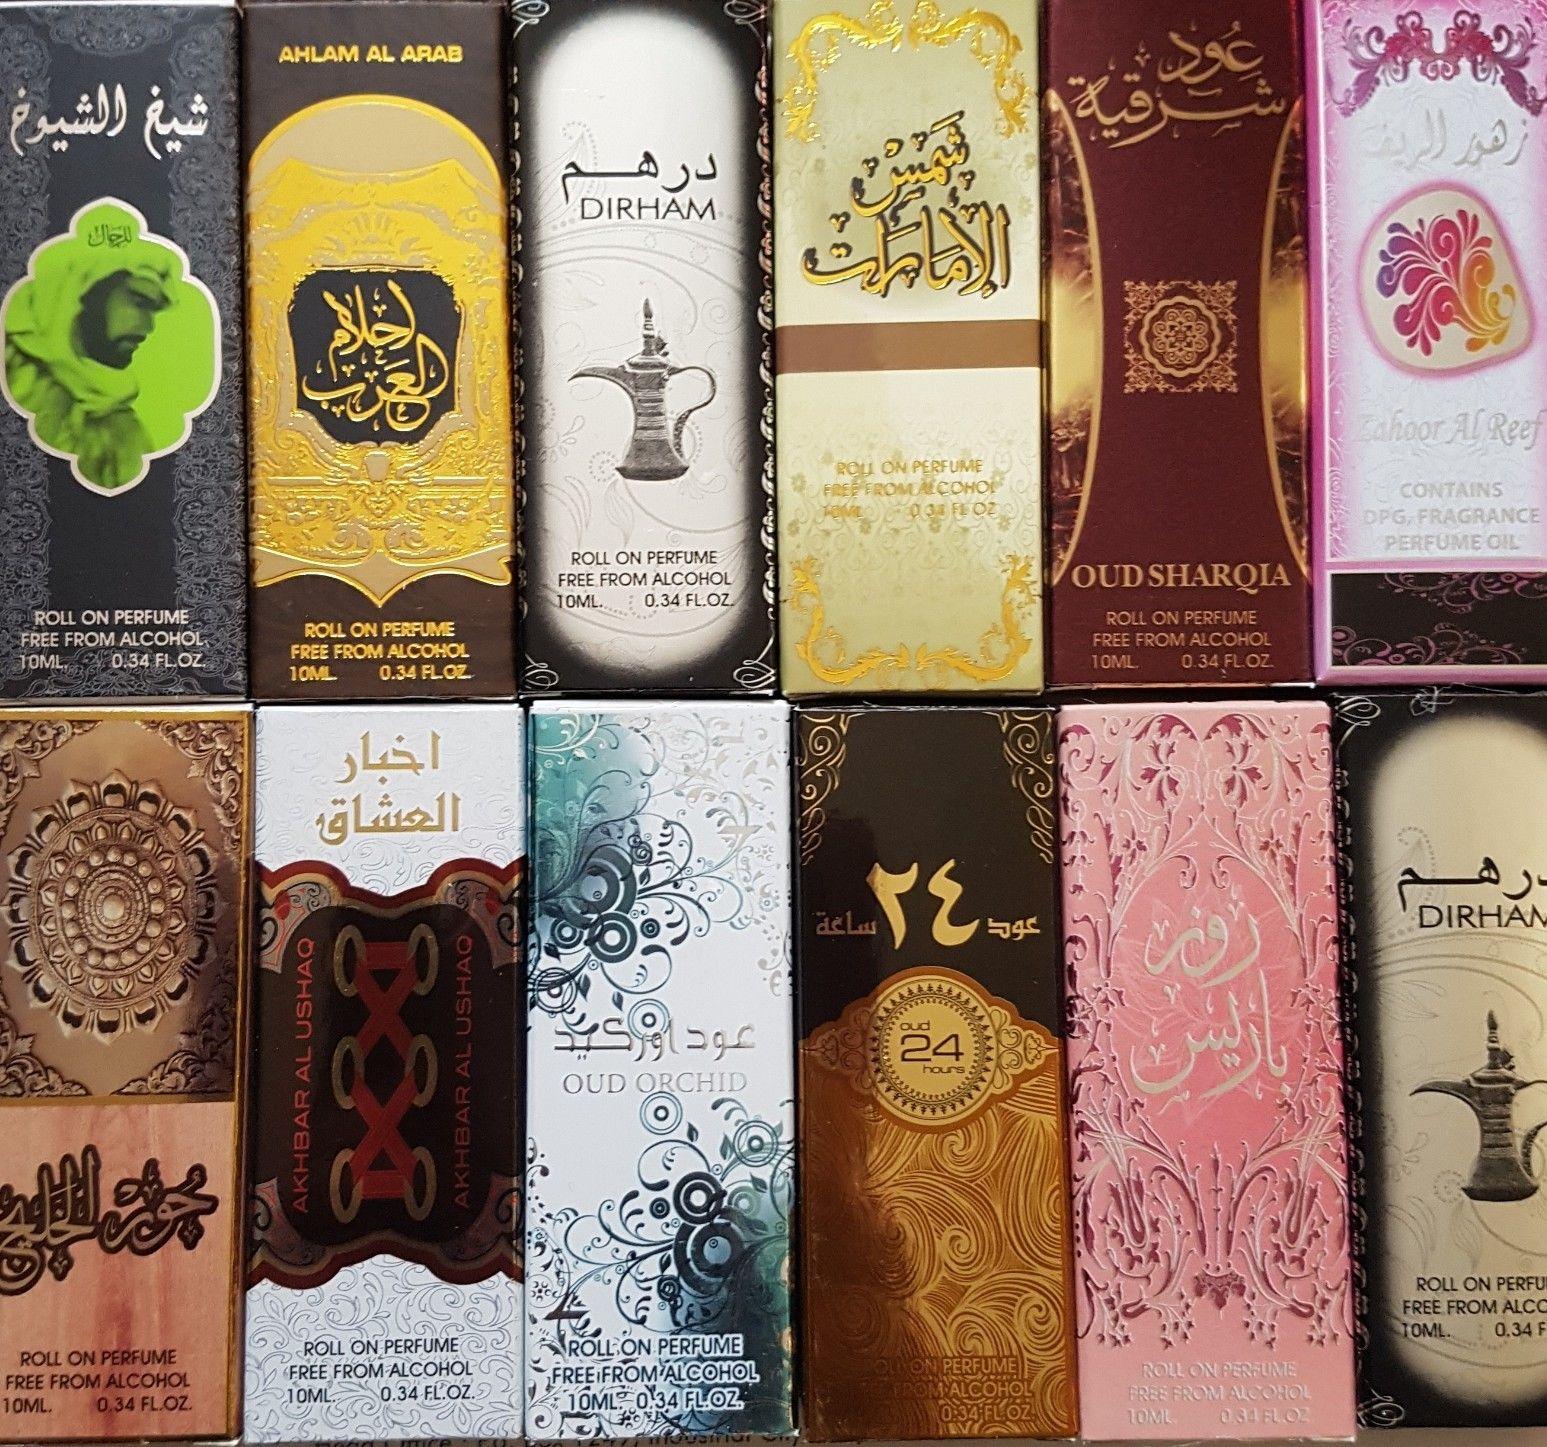 Choose Any 10ml Ard Al Zaafaran Perfume Fragrance Oil Roll On